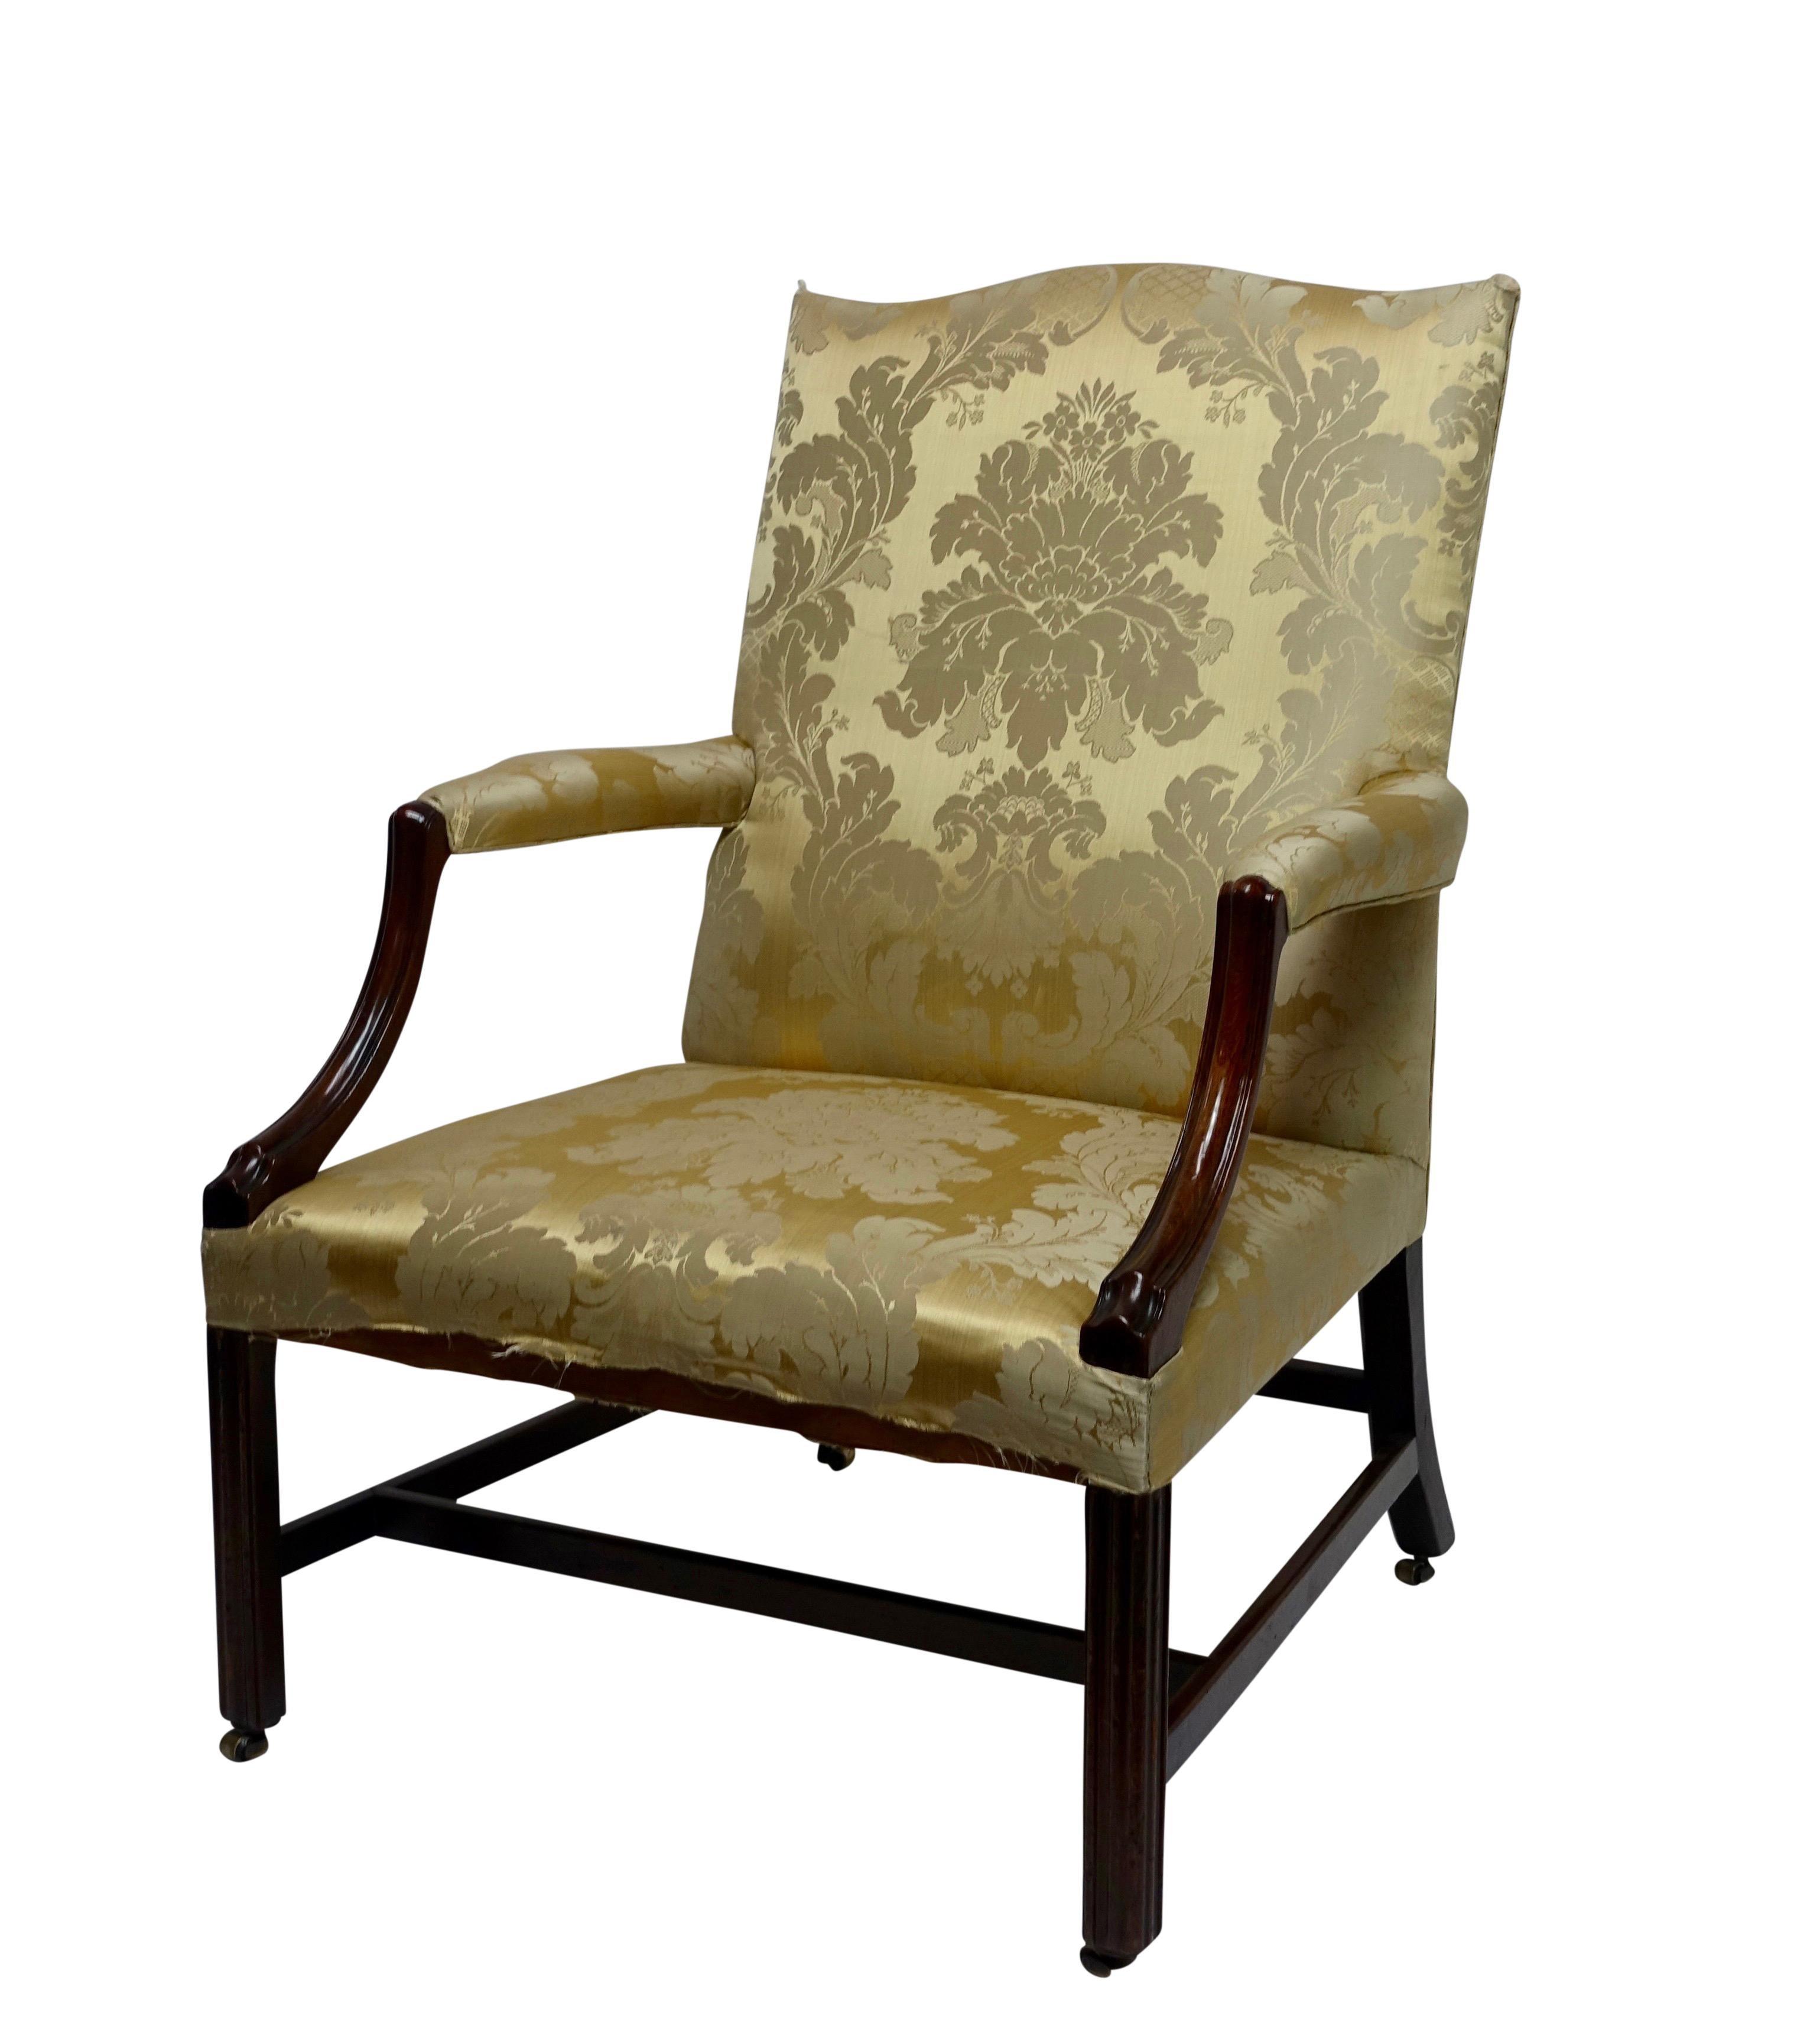 Mahogany Gainsborough Library Chair, England 18th Century